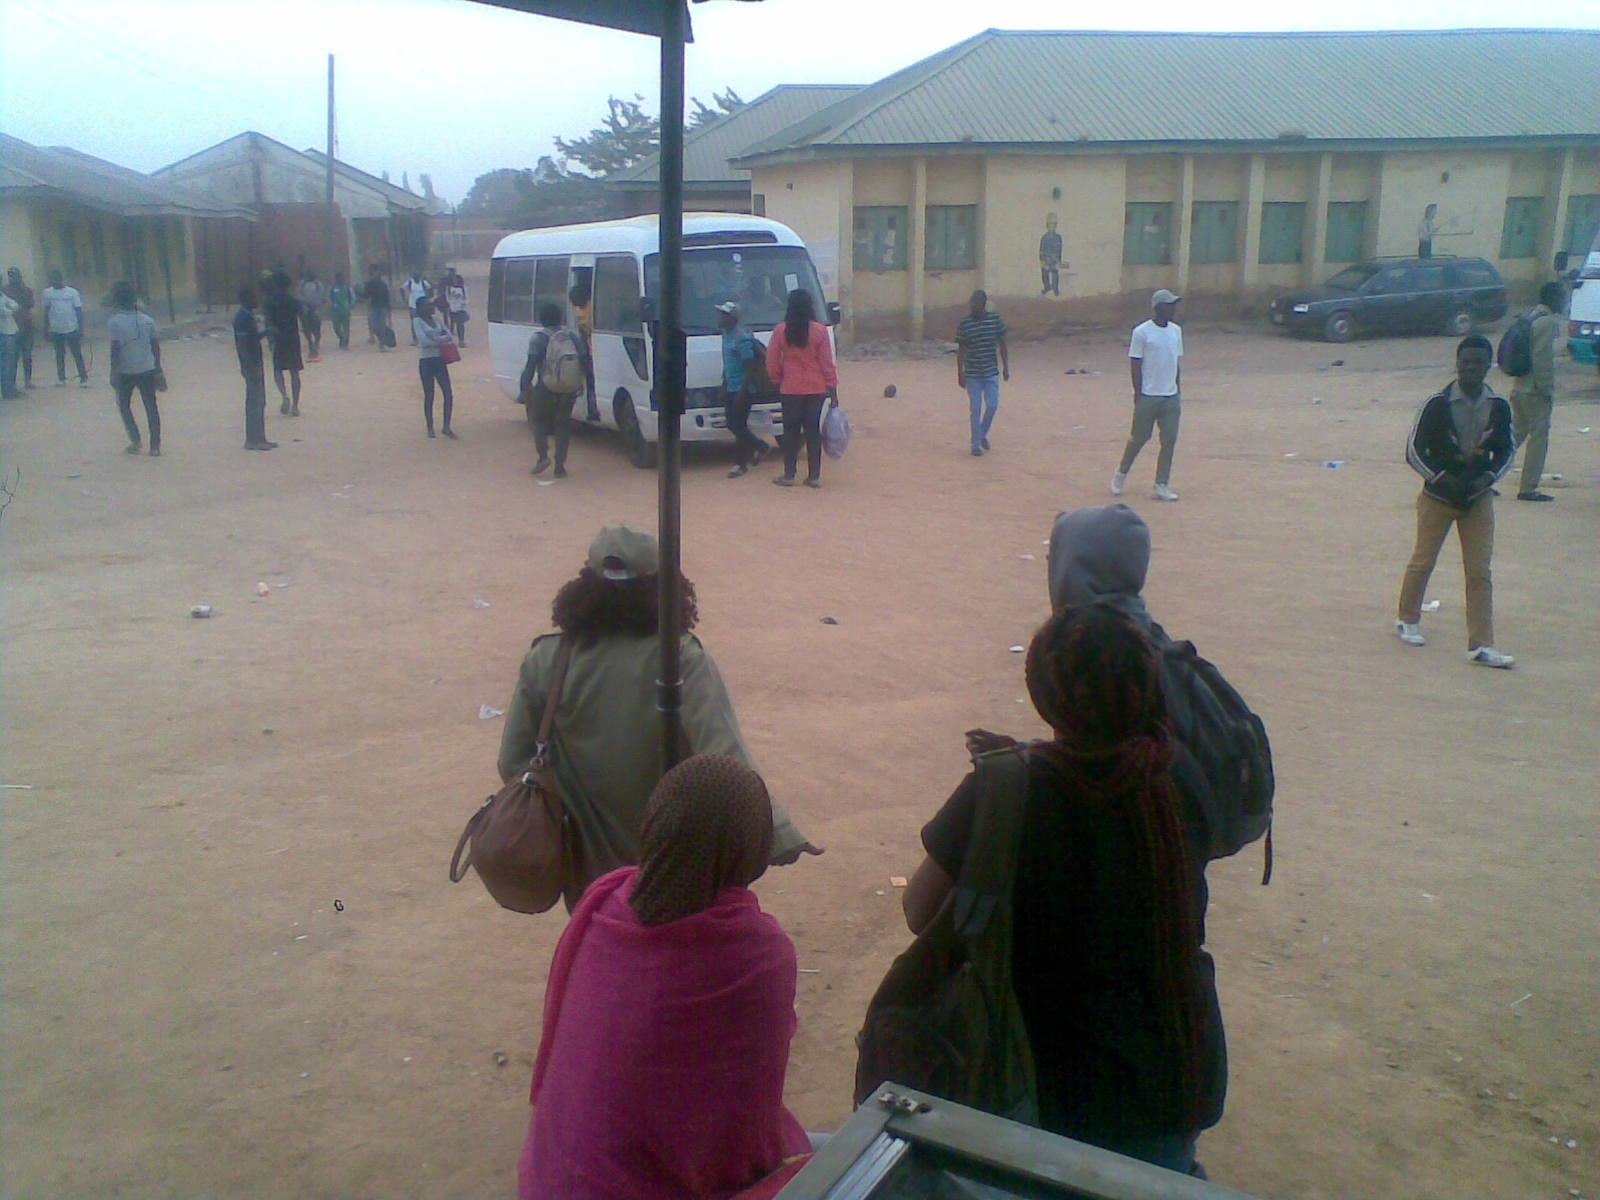 8781160 16022019 jpeg110a1a02dc52ed341836dc889f7b7977 - INEC Postpone Elections: Adhoc Staff Returning To Their Destinations (Photos)